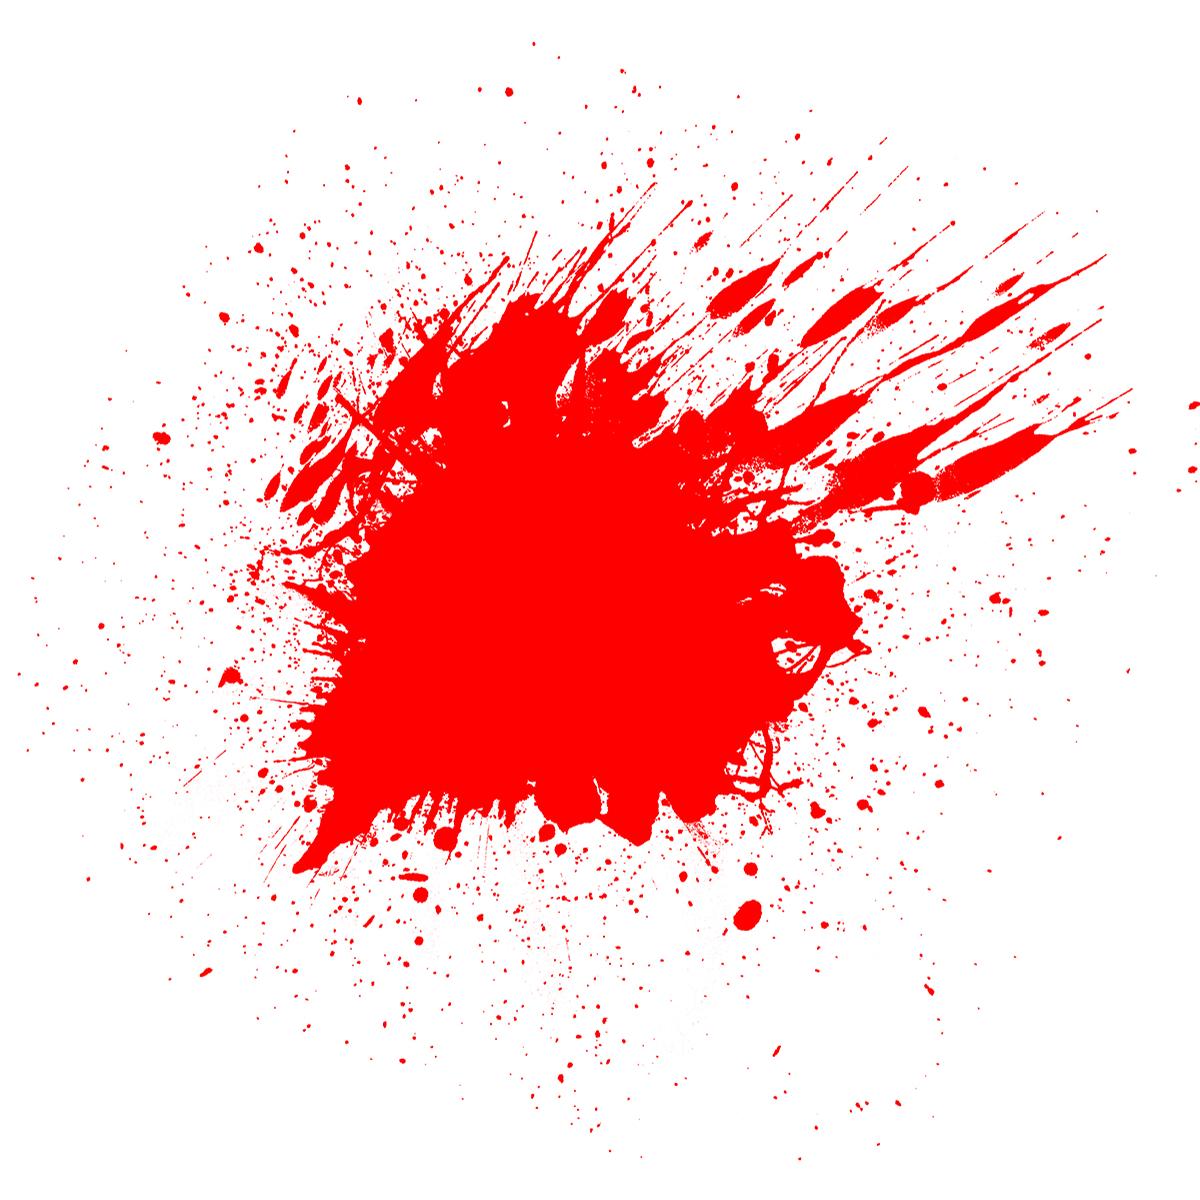 como quitar las manchas de sangre seca